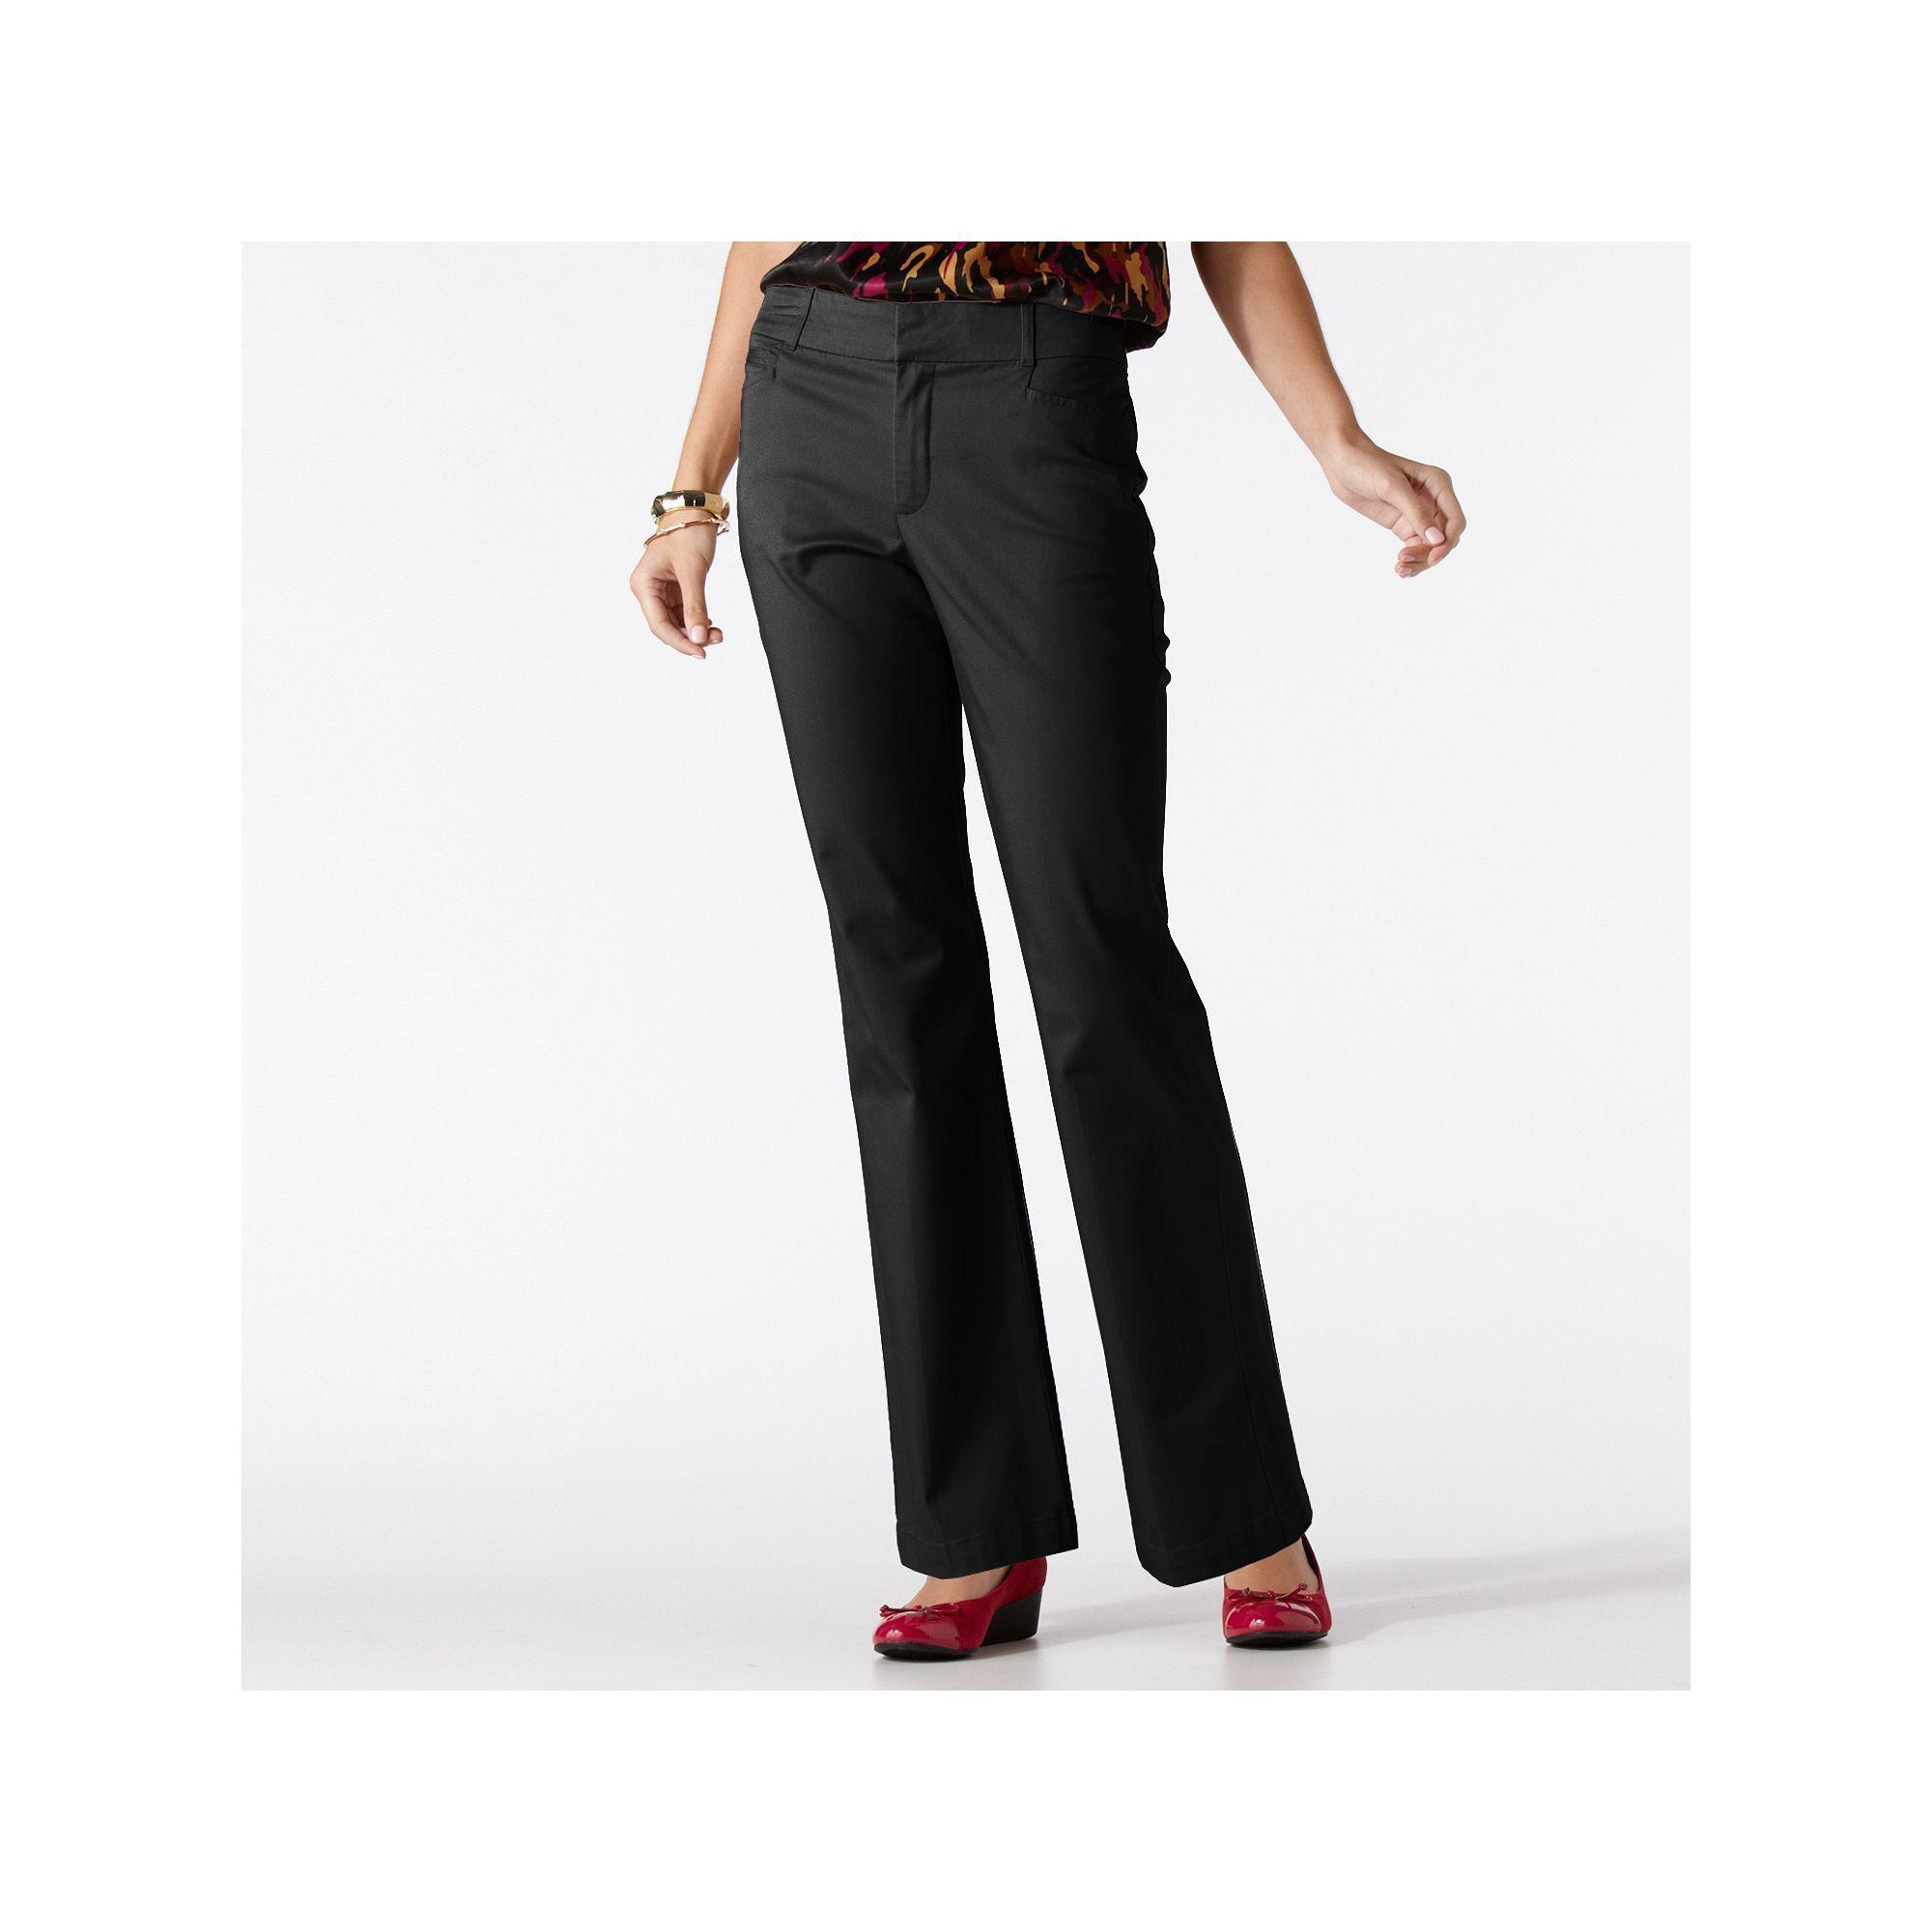 7a2e59acb53c8 Women's Gloria Vanderbilt Charlene Comfort Waist Dress Pants, Size: 8 -  regular, Black